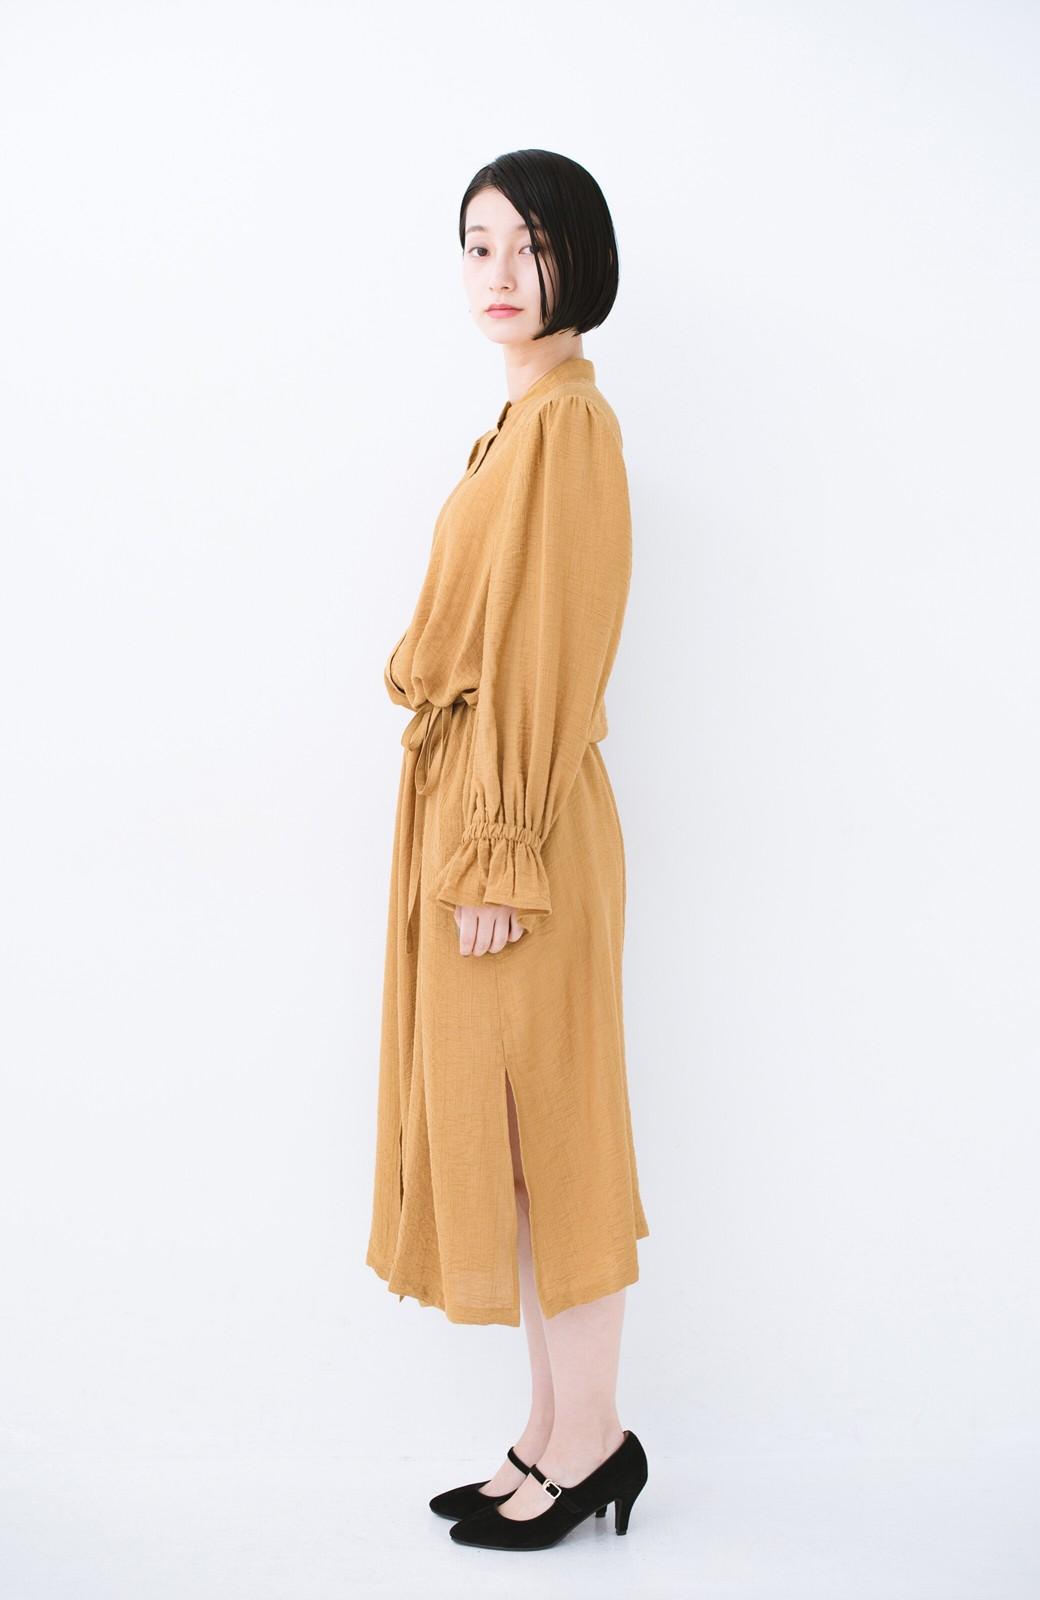 haco! 太ってもばれず 羽織っても便利なウエストリボンワンピース <マスタード>の商品写真13